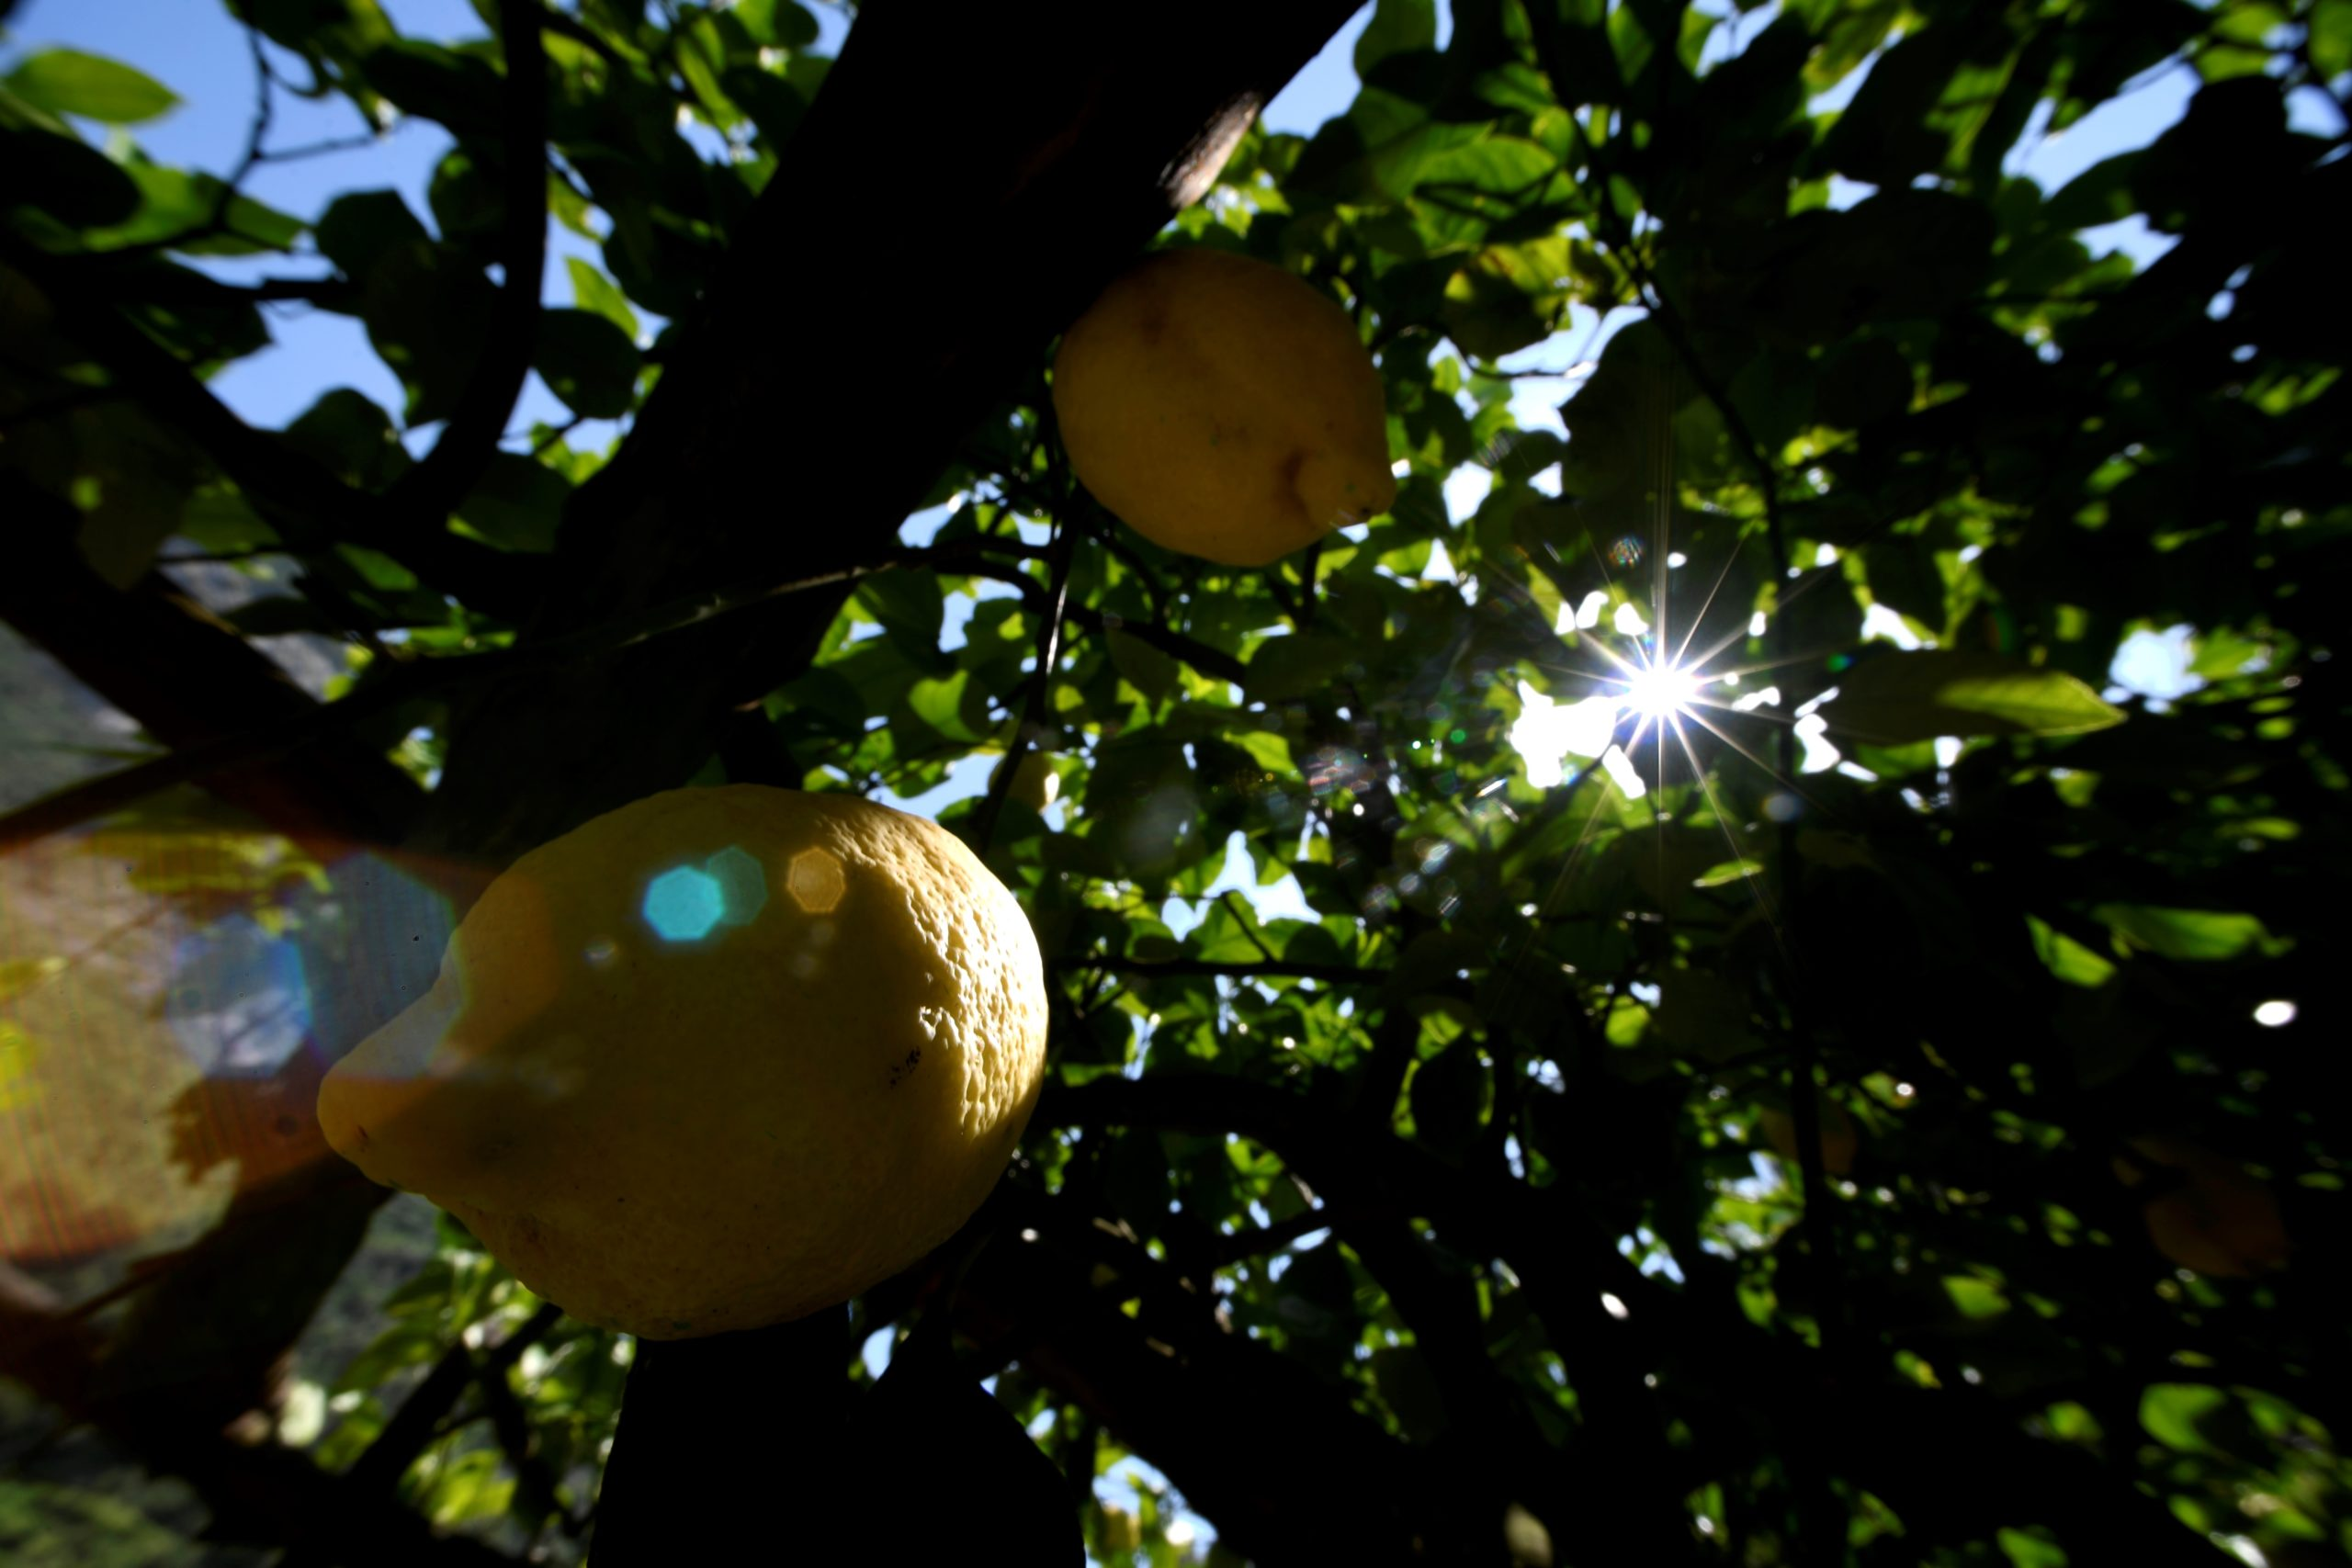 Lemon are seen in the Aceto family lemon tree farm, on July 2, 2020 in Amalfi. (Photo by Filippo MONTEFORTE / AFP) (Photo by FILIPPO MONTEFORTE/AFP via Getty Images)